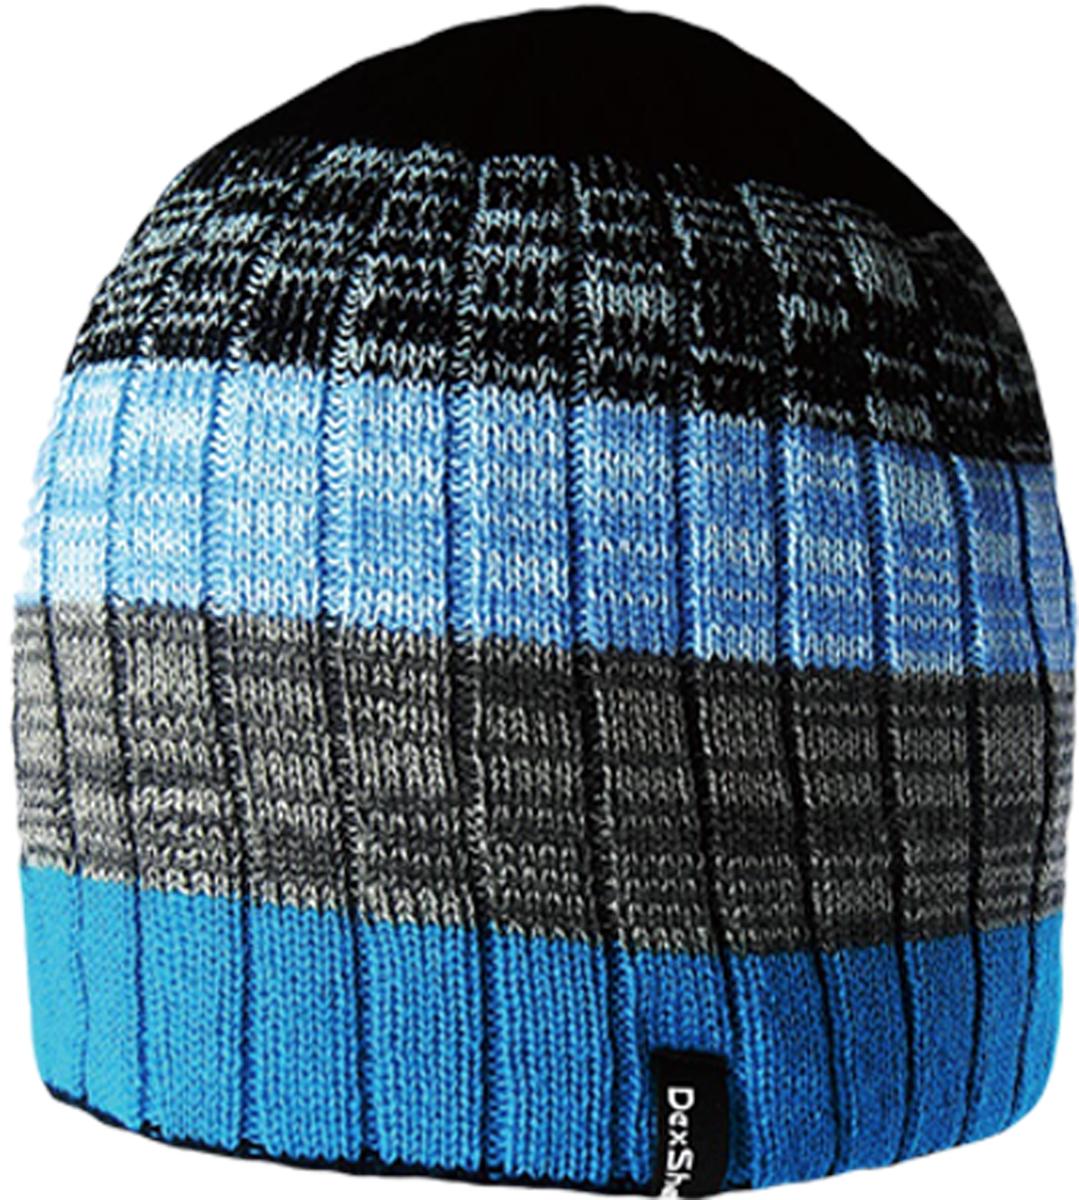 Шапка водонепроницаемая Dexshell, цвет: голубой. DH332N. Размер универсальный цена